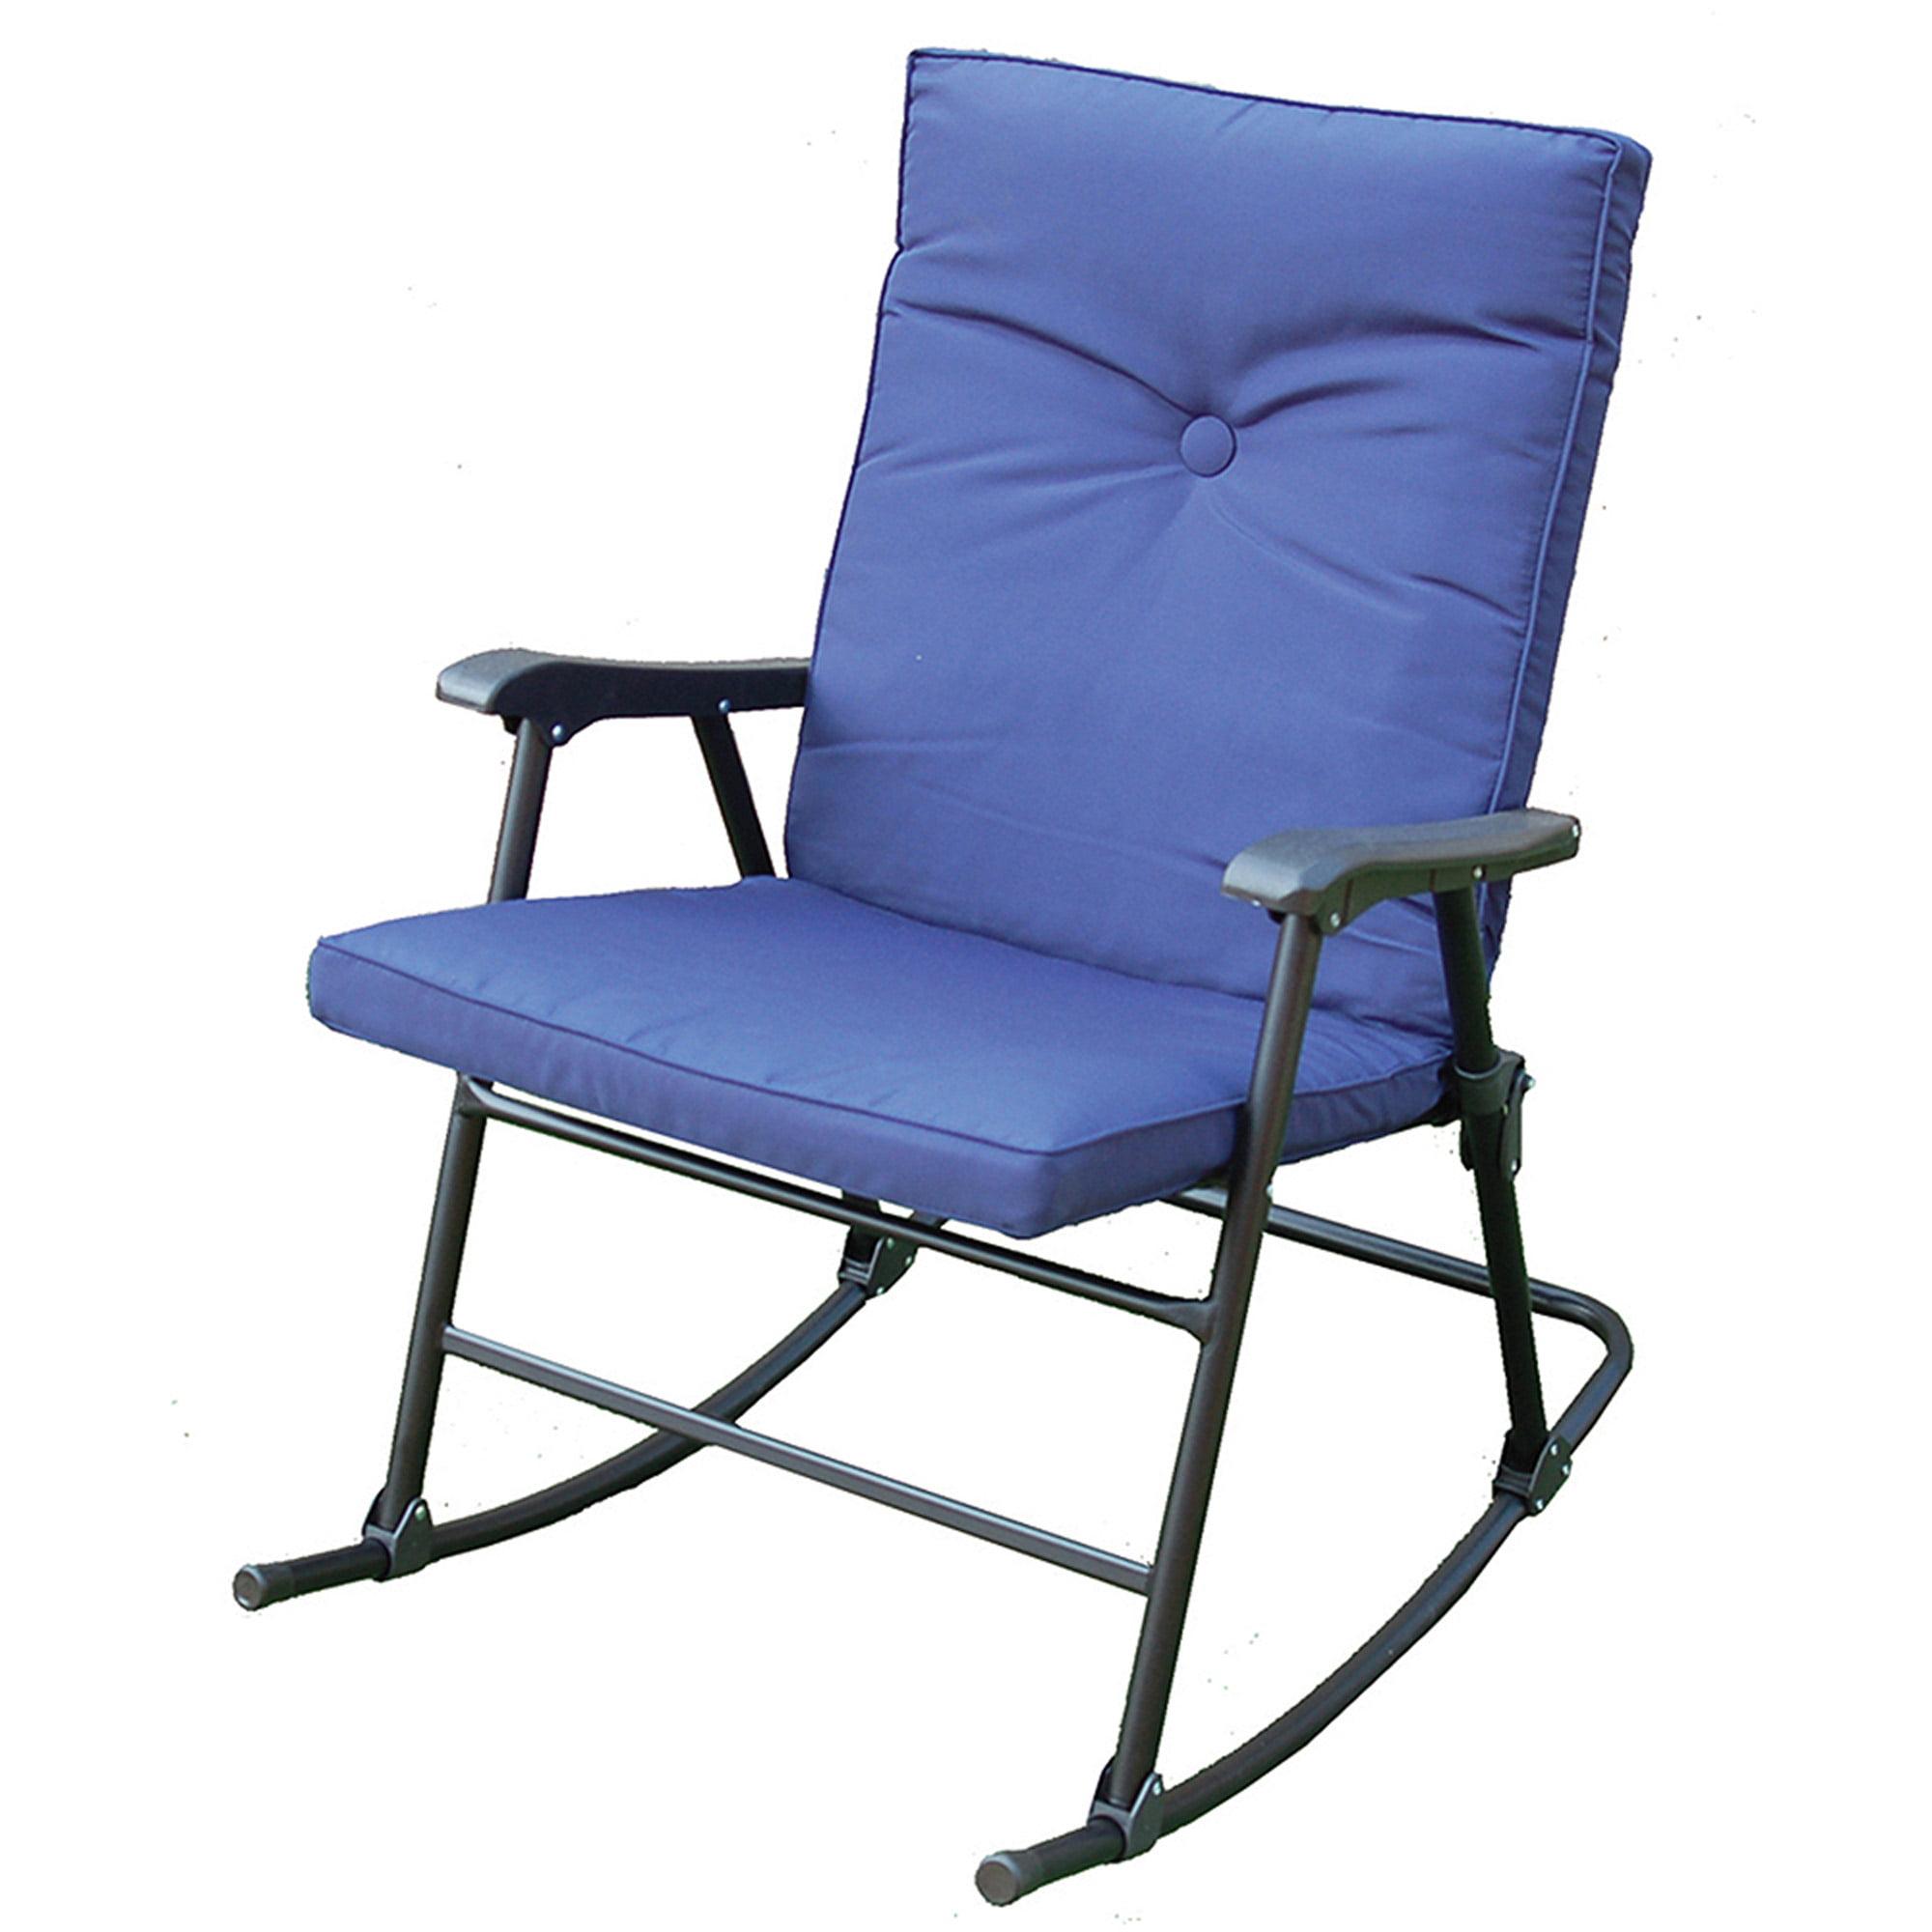 Prime Products La Jolla Rocker California Blue 13 6602 Walmart